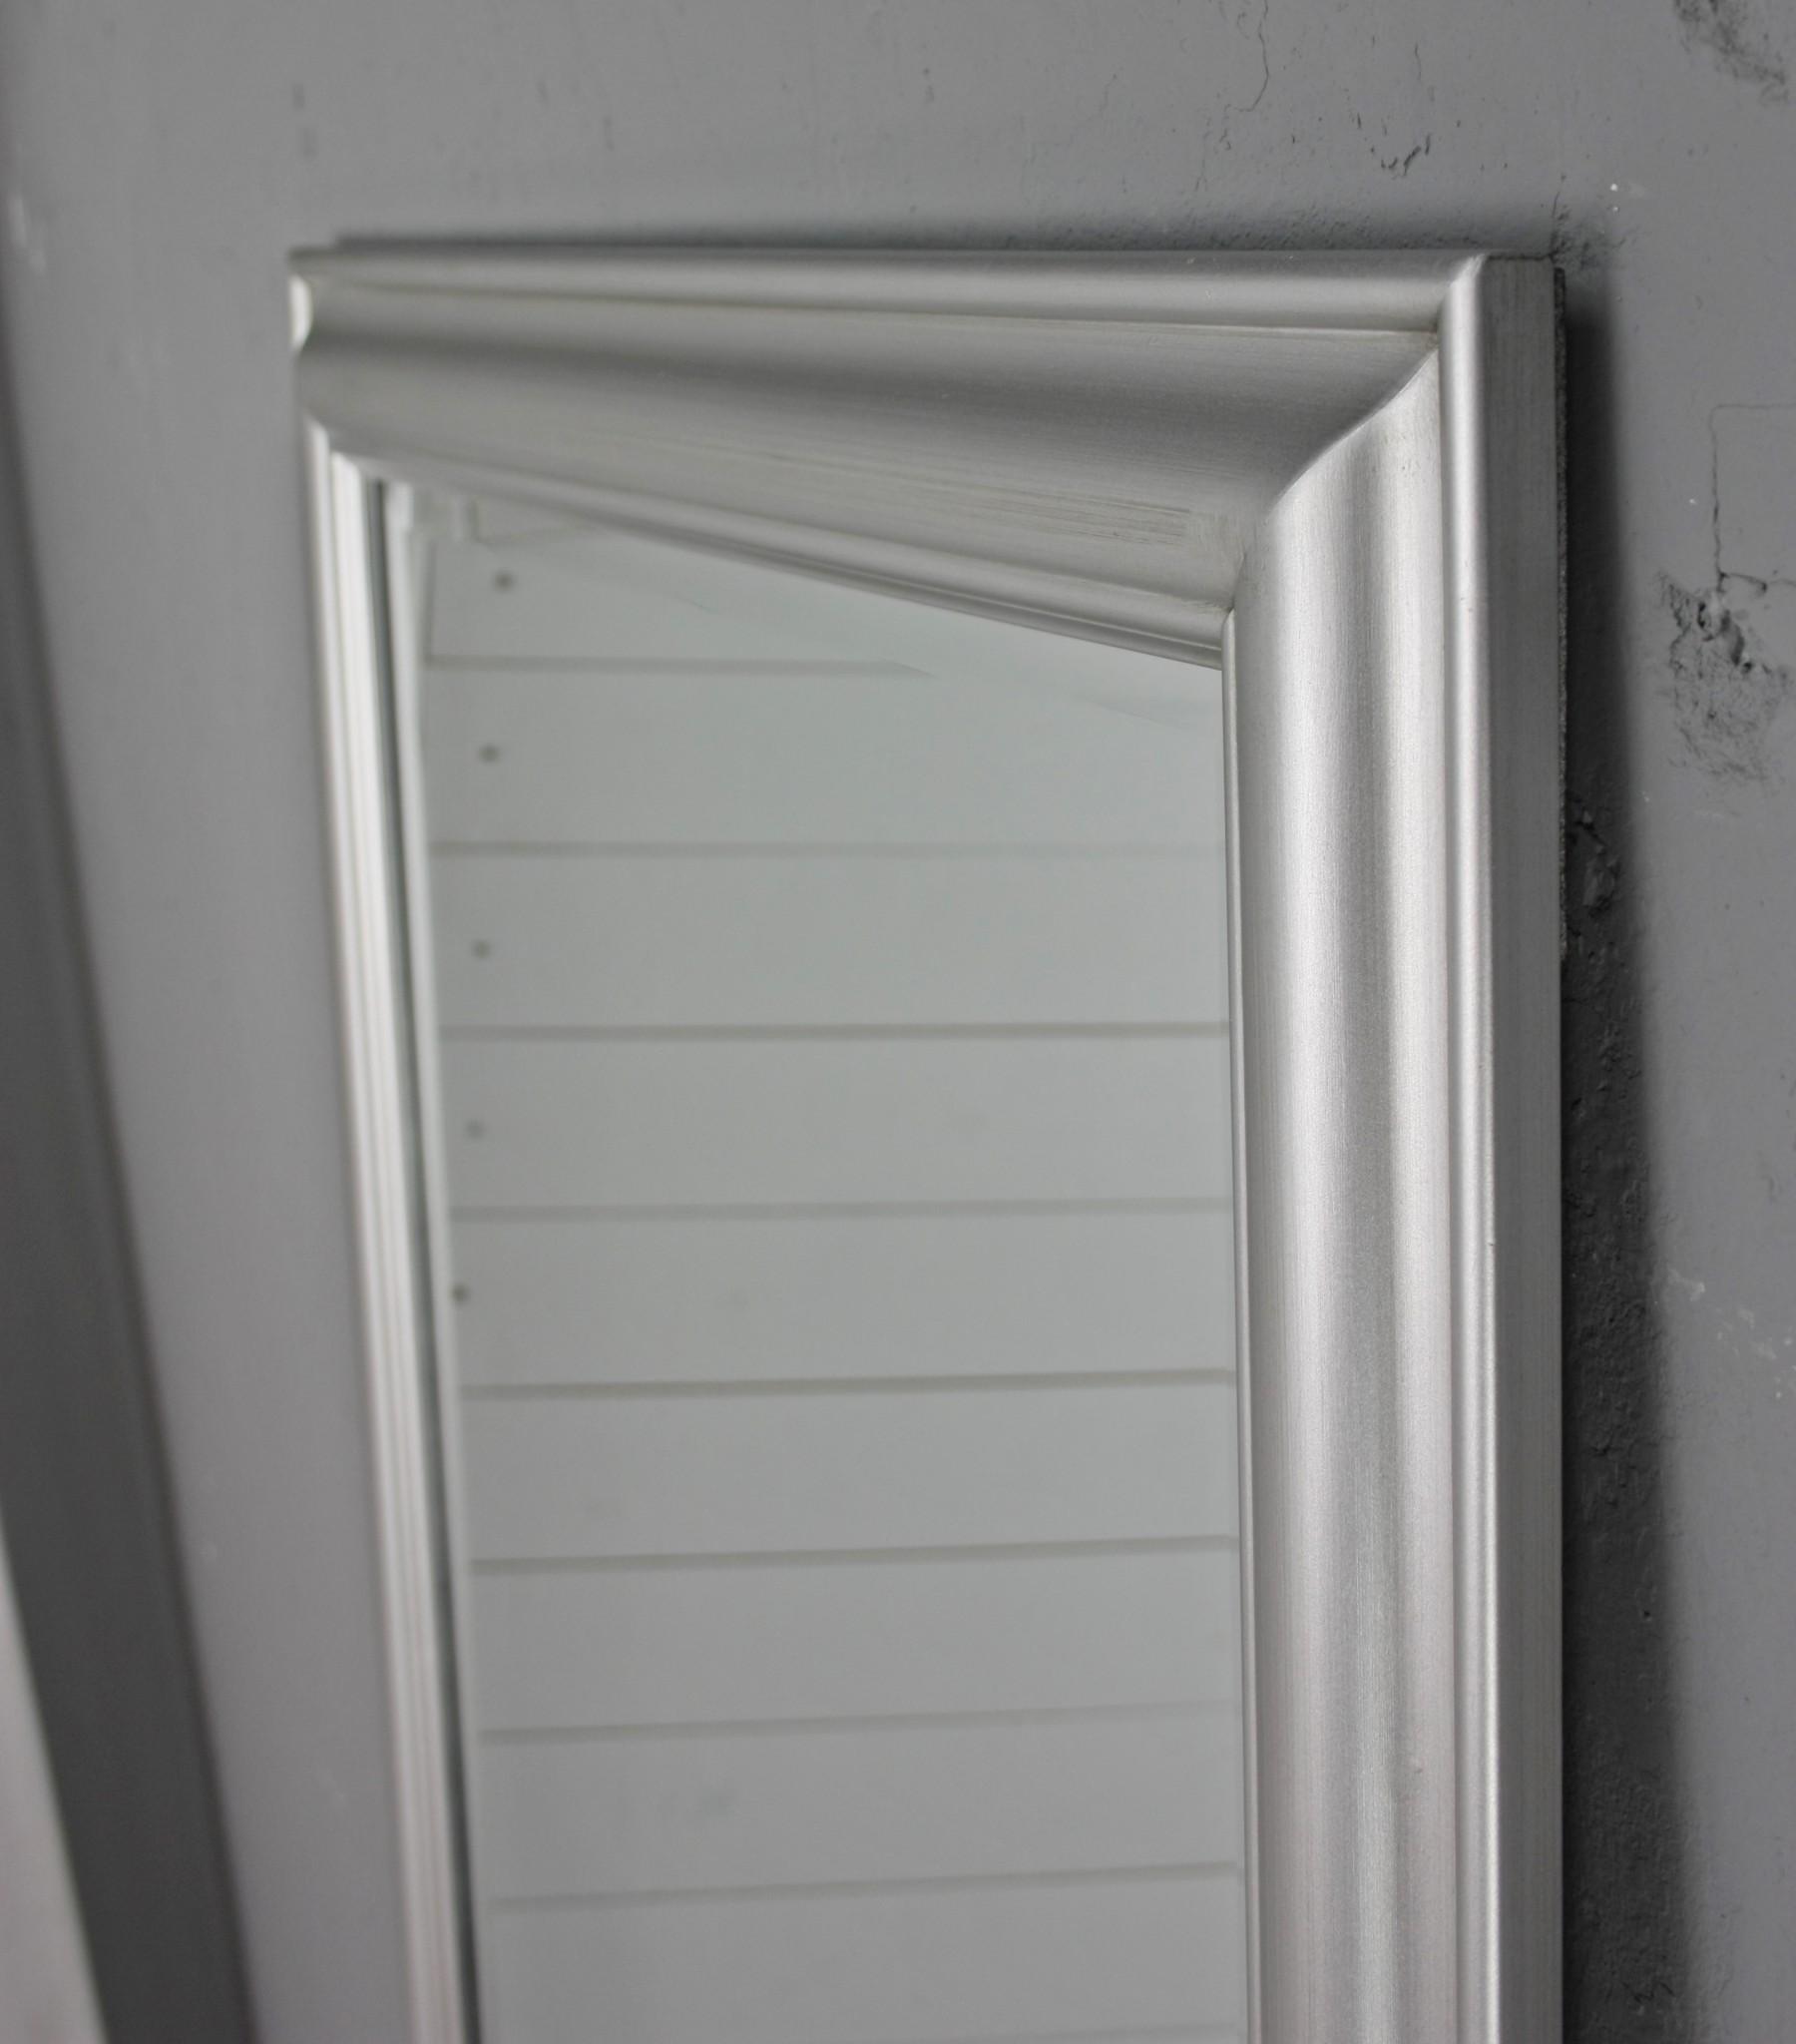 Miroir salle de bain cadre bois awesome cadre salle de for Miroir salle de bain pas cher